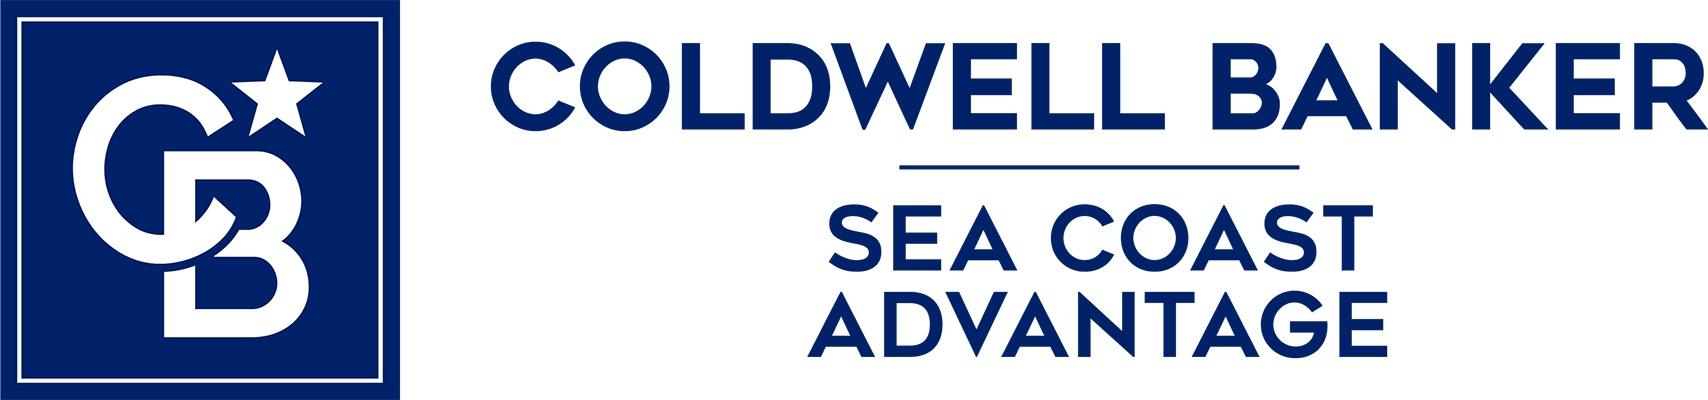 Nancy Nipper - Coldwell Banker Sea Coast Advantage Realty Logo